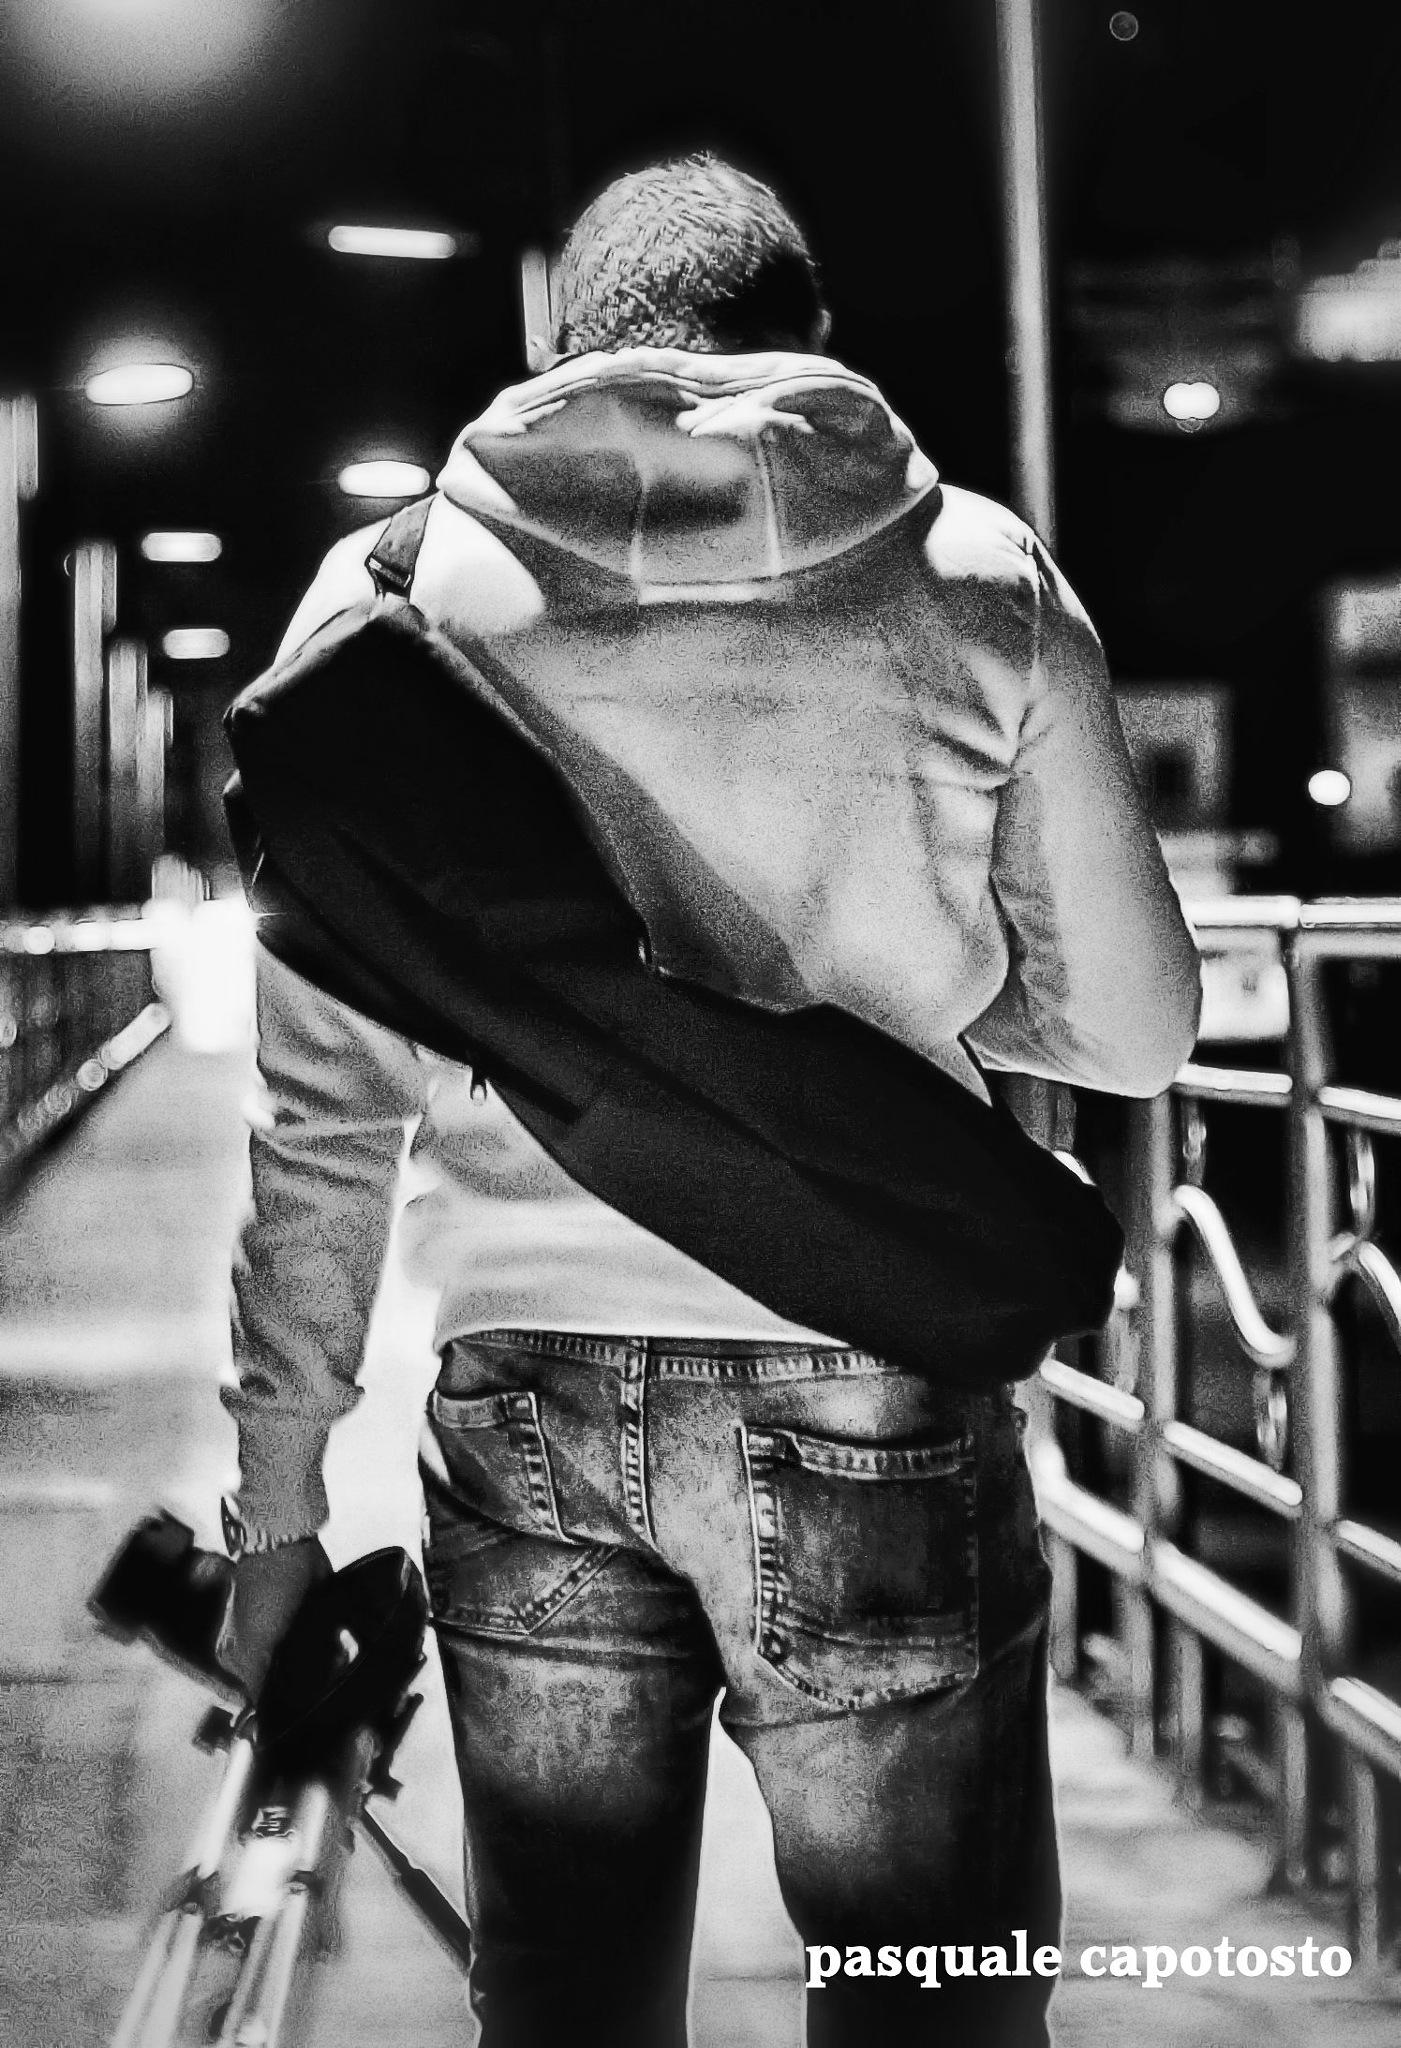 photographer by Pasquale Capotosto